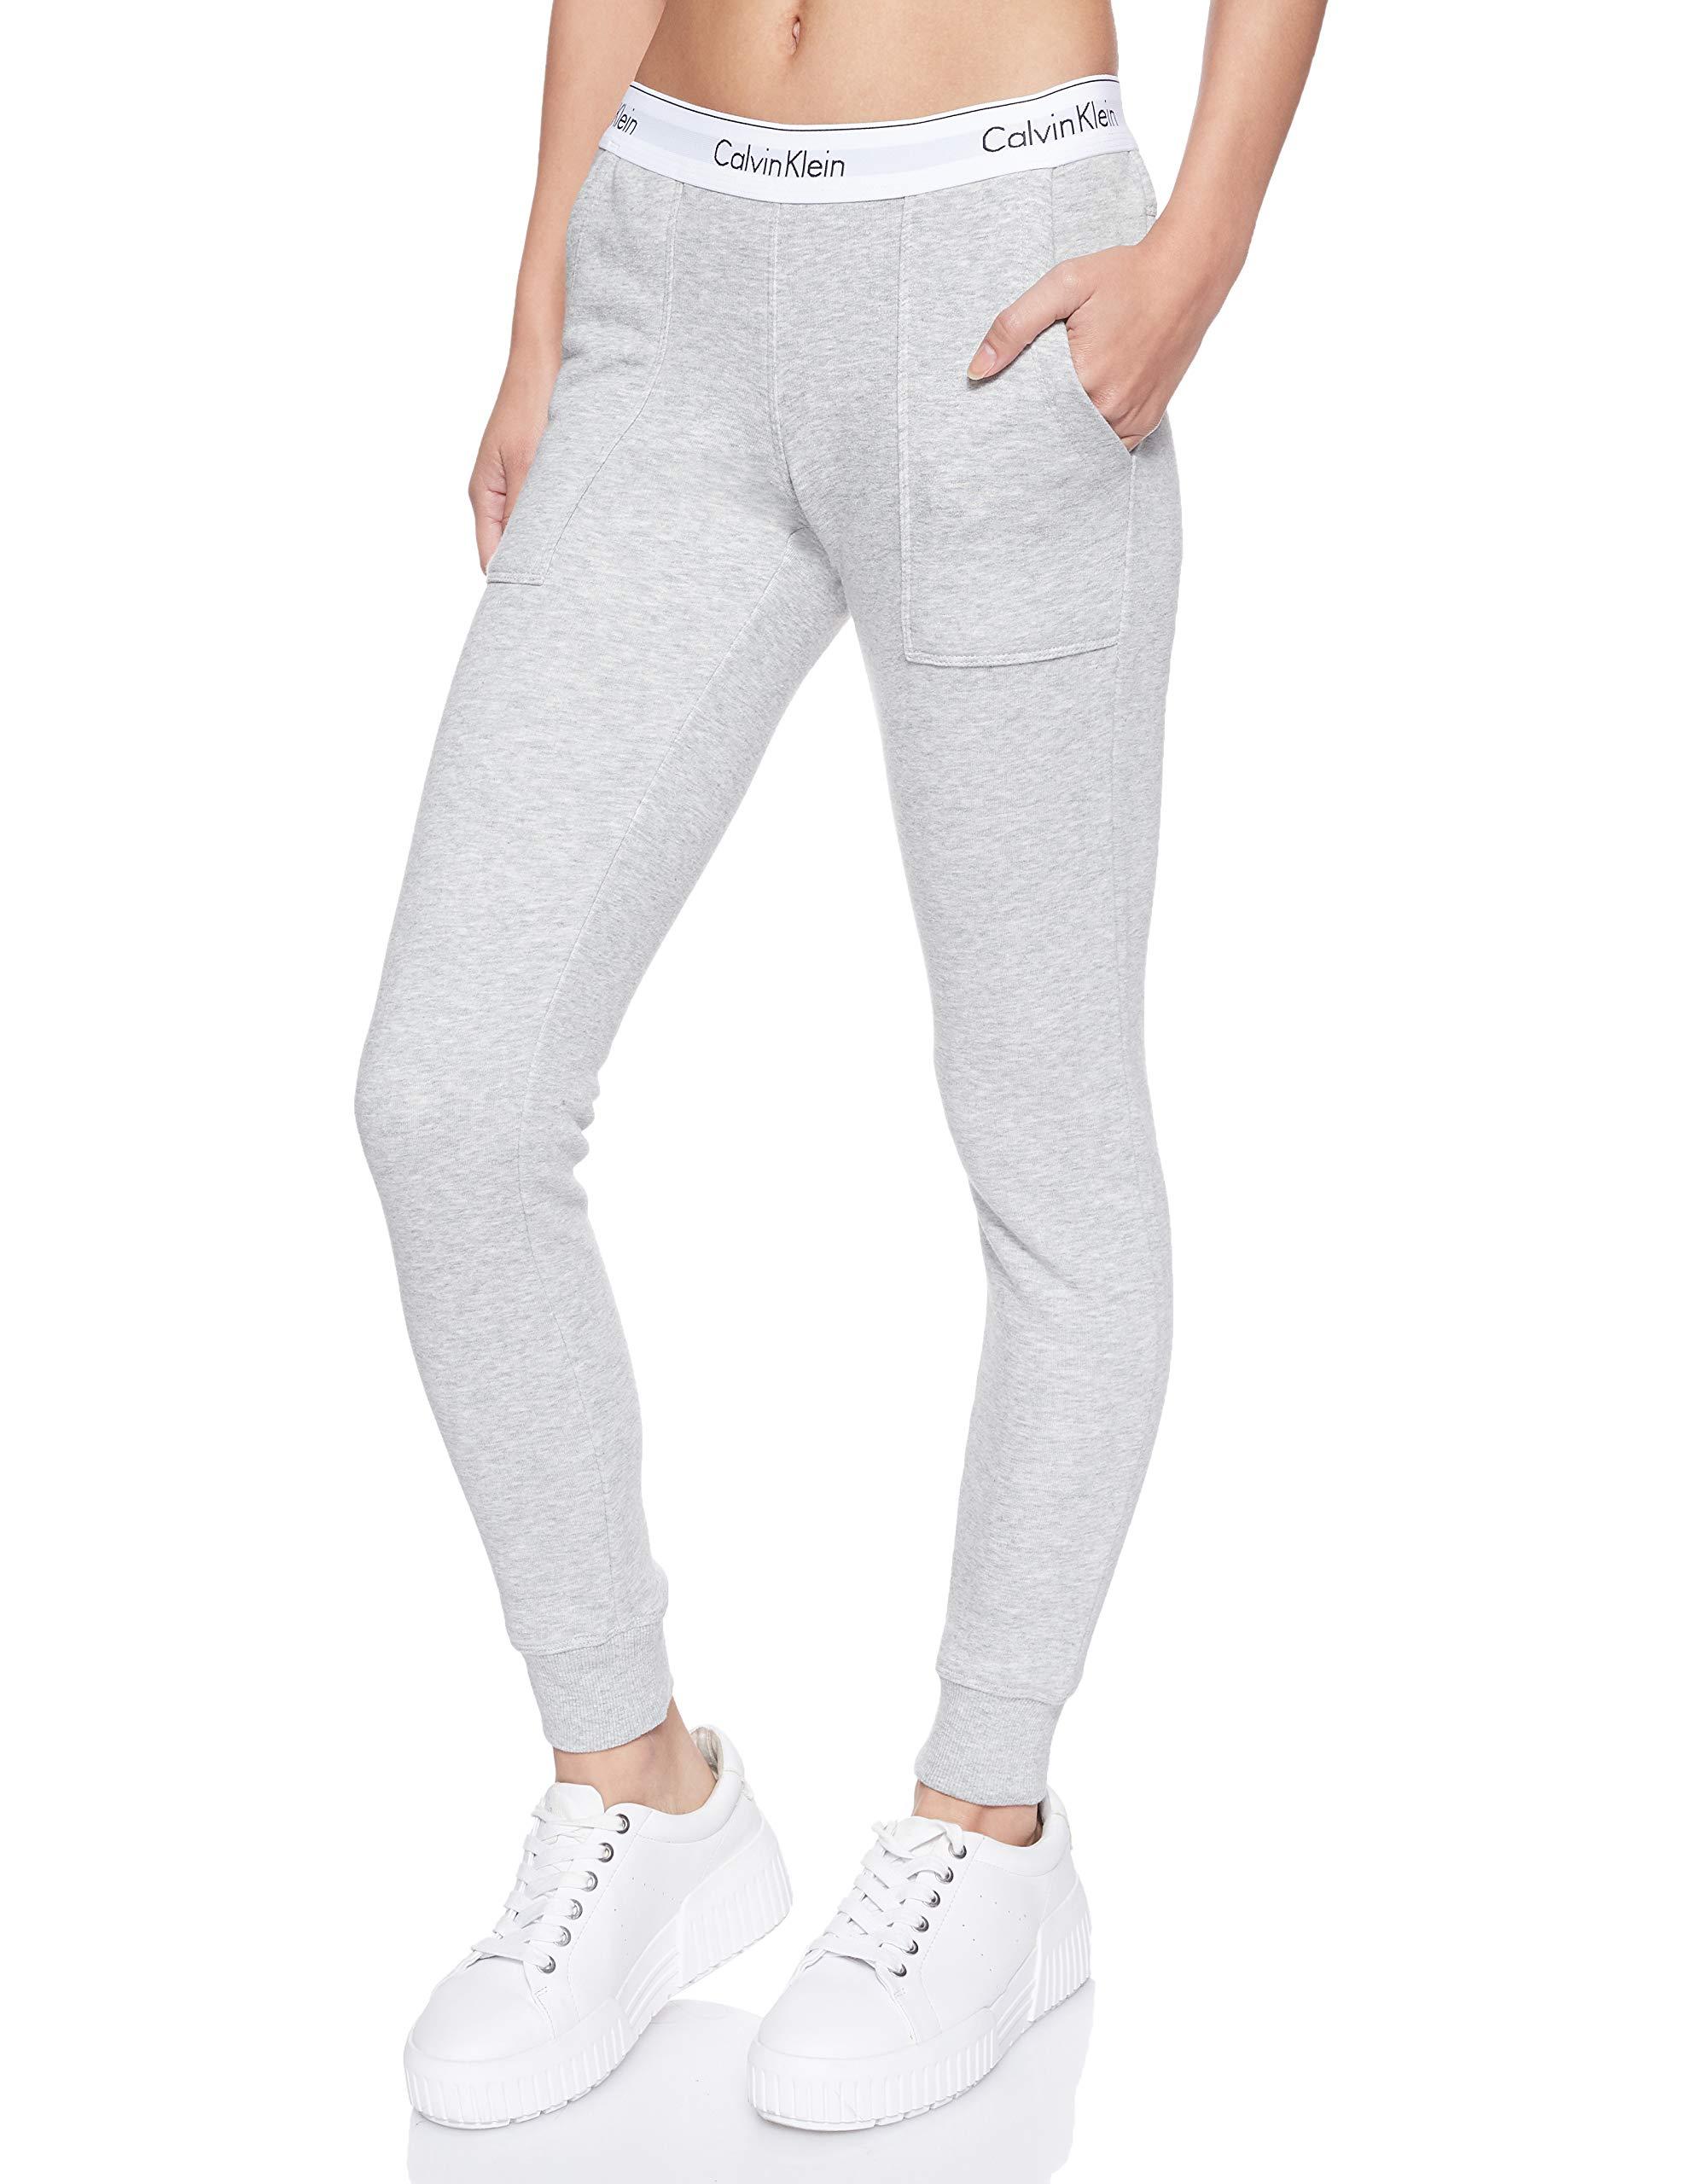 Calvin Klein Women's Bottom Pant Jogger Jeans